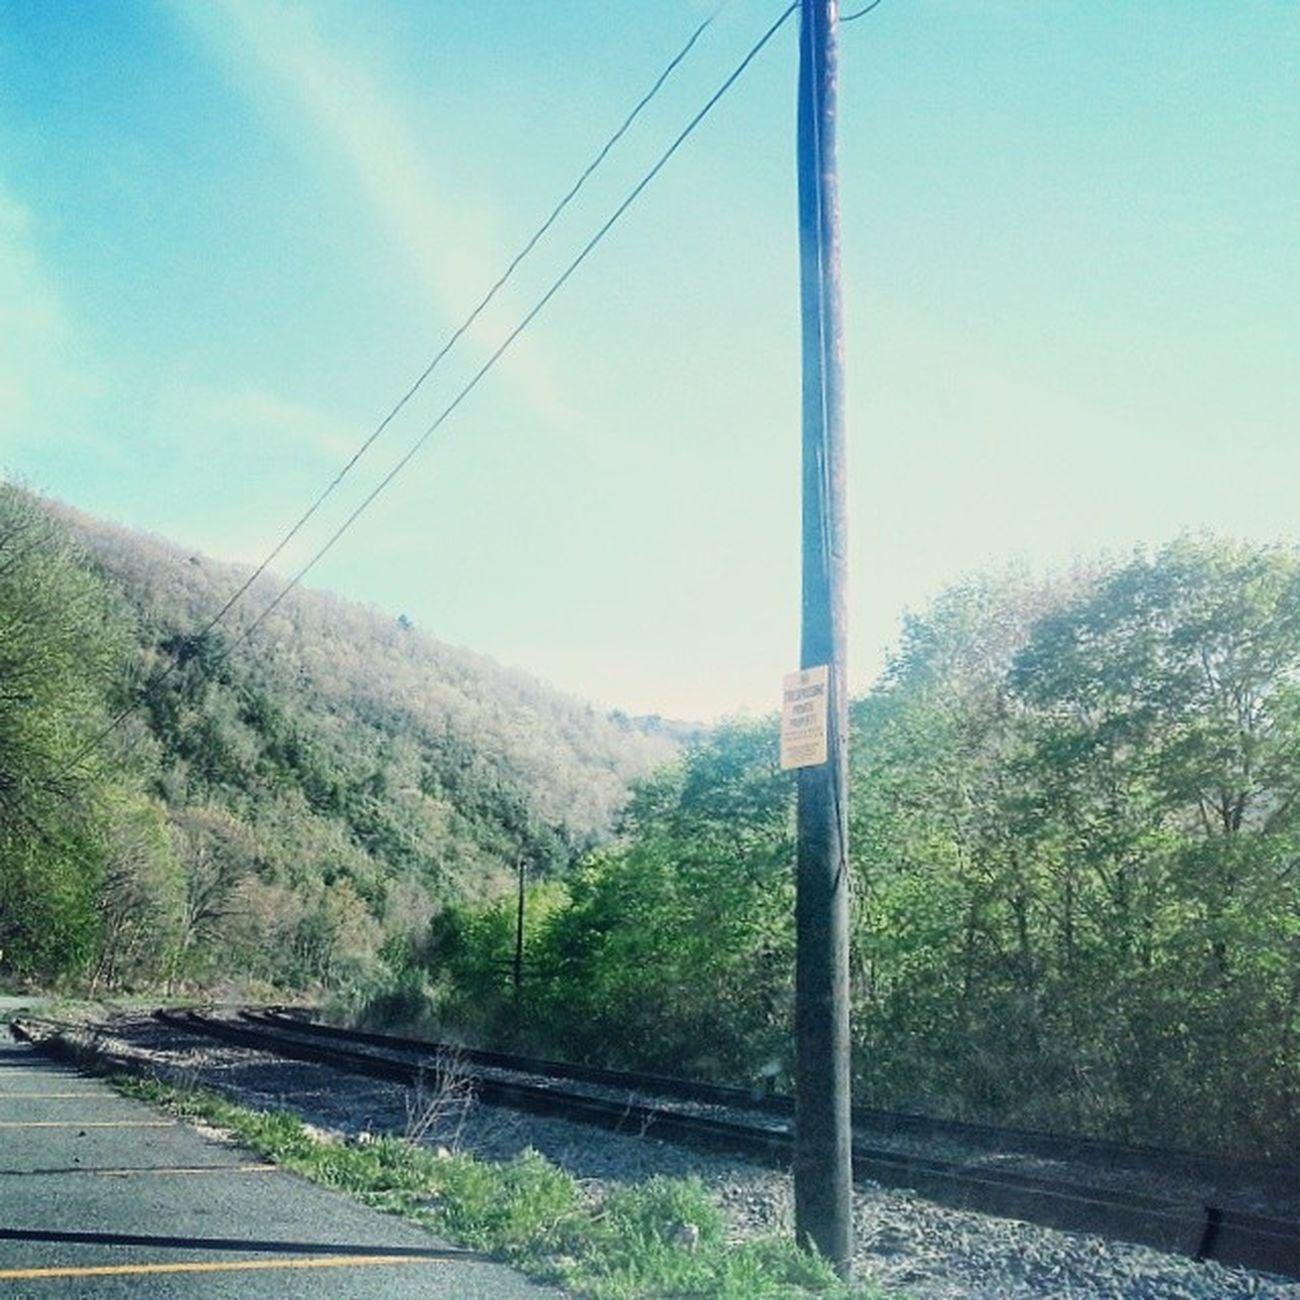 Lehigh Valley railroad Coalcountry Mauchchunk Traintracks Bearmountain Lehighcoalandnavigation lehighrivergorge Appalachia poconos telephonepoles